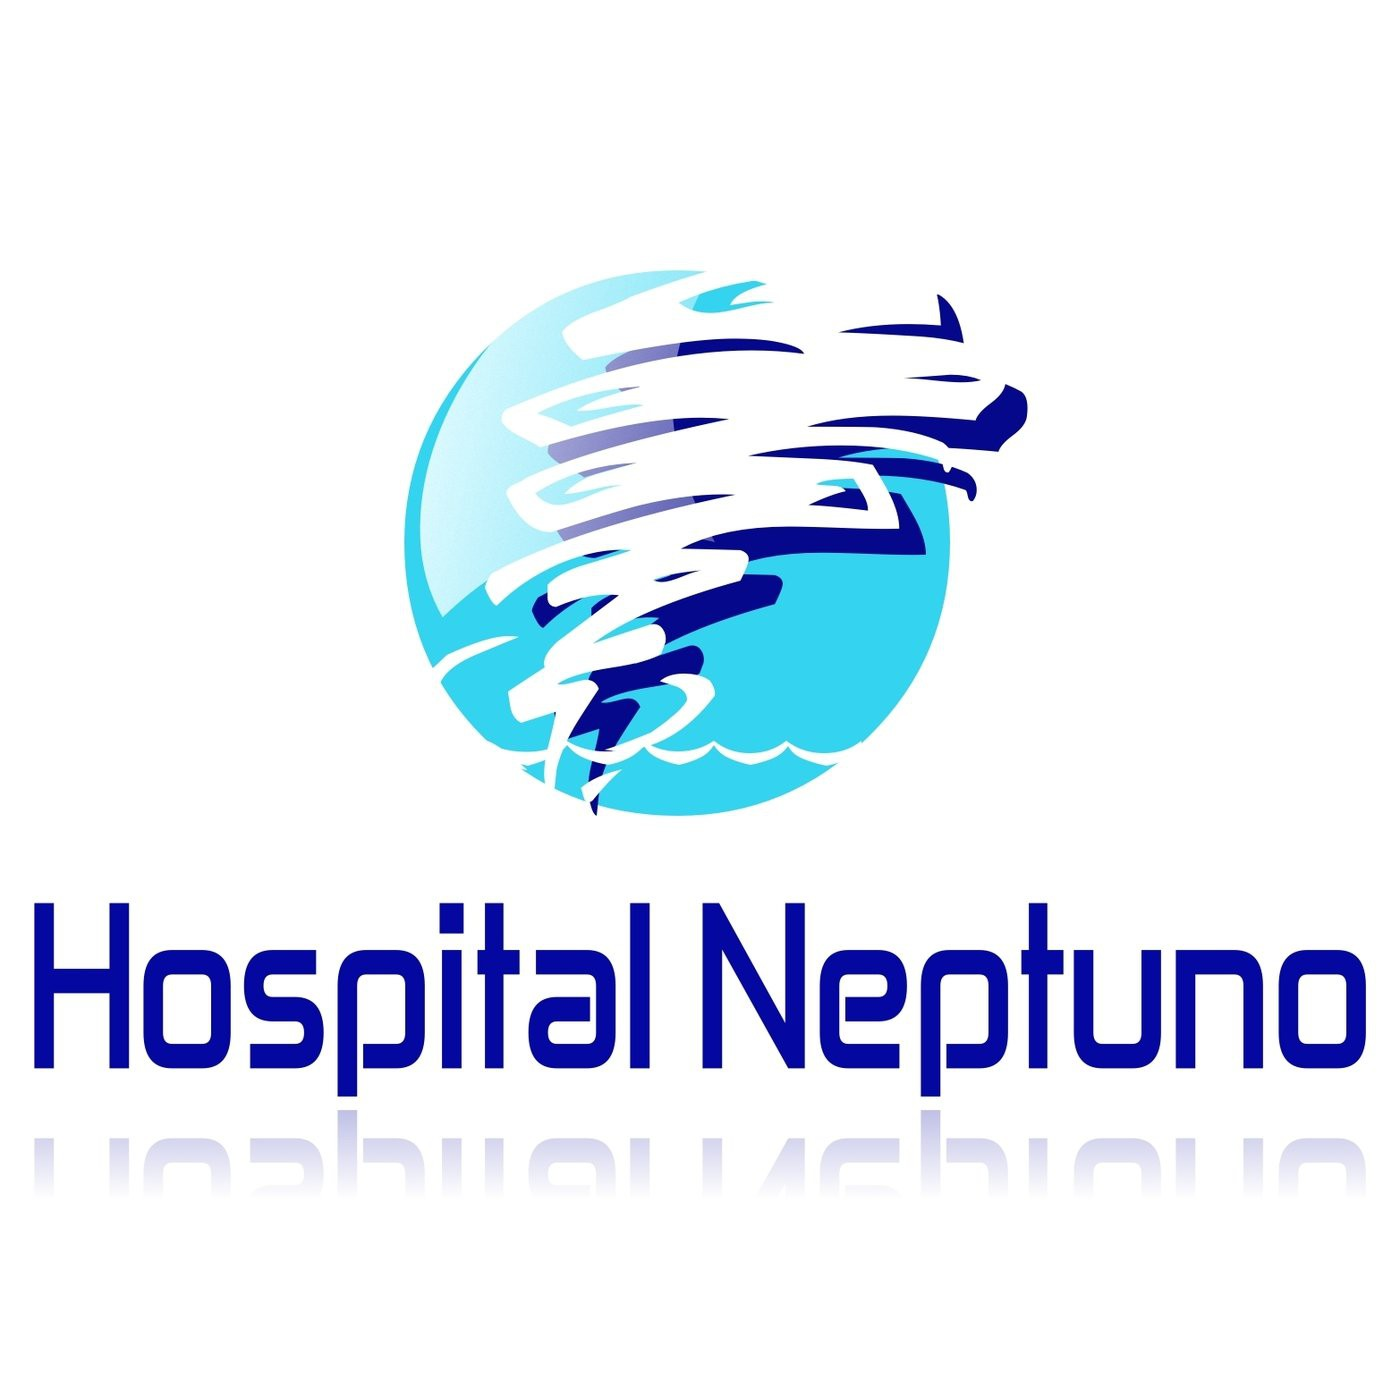 <![CDATA[Hospital Neptuno]]>